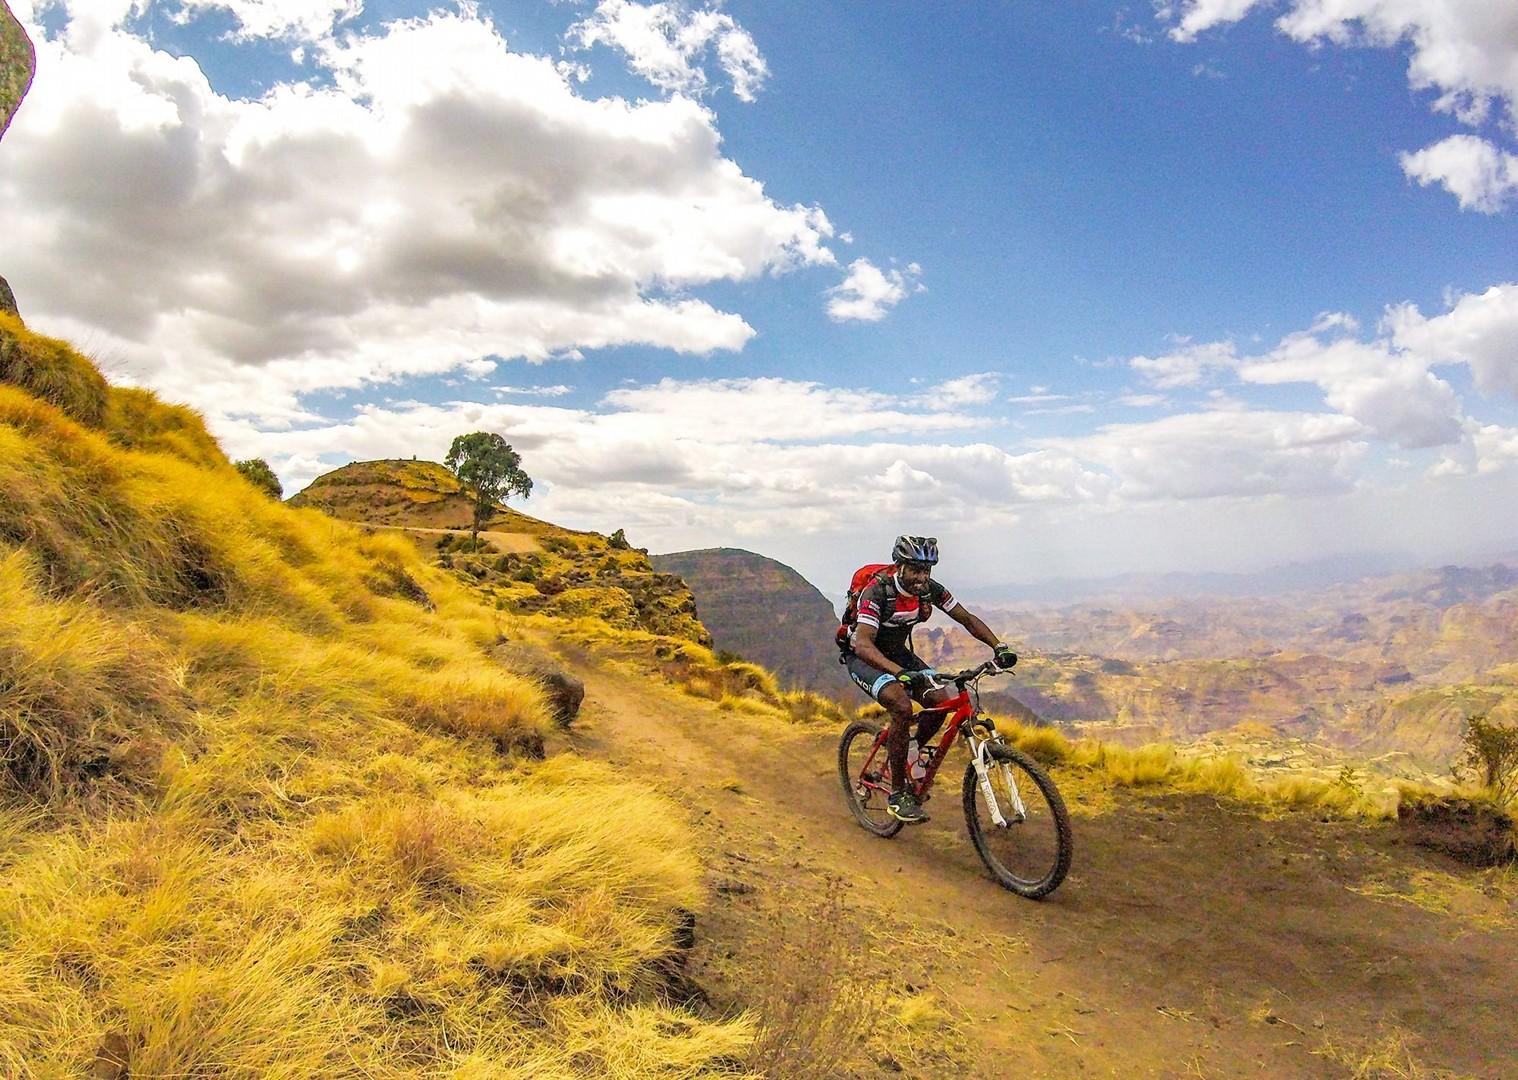 ethiopia-enchanting-trip-adventures-cycling-holiday.jpg - NEW! Ethiopia - Enchanting Ethiopia - Cycling Adventures